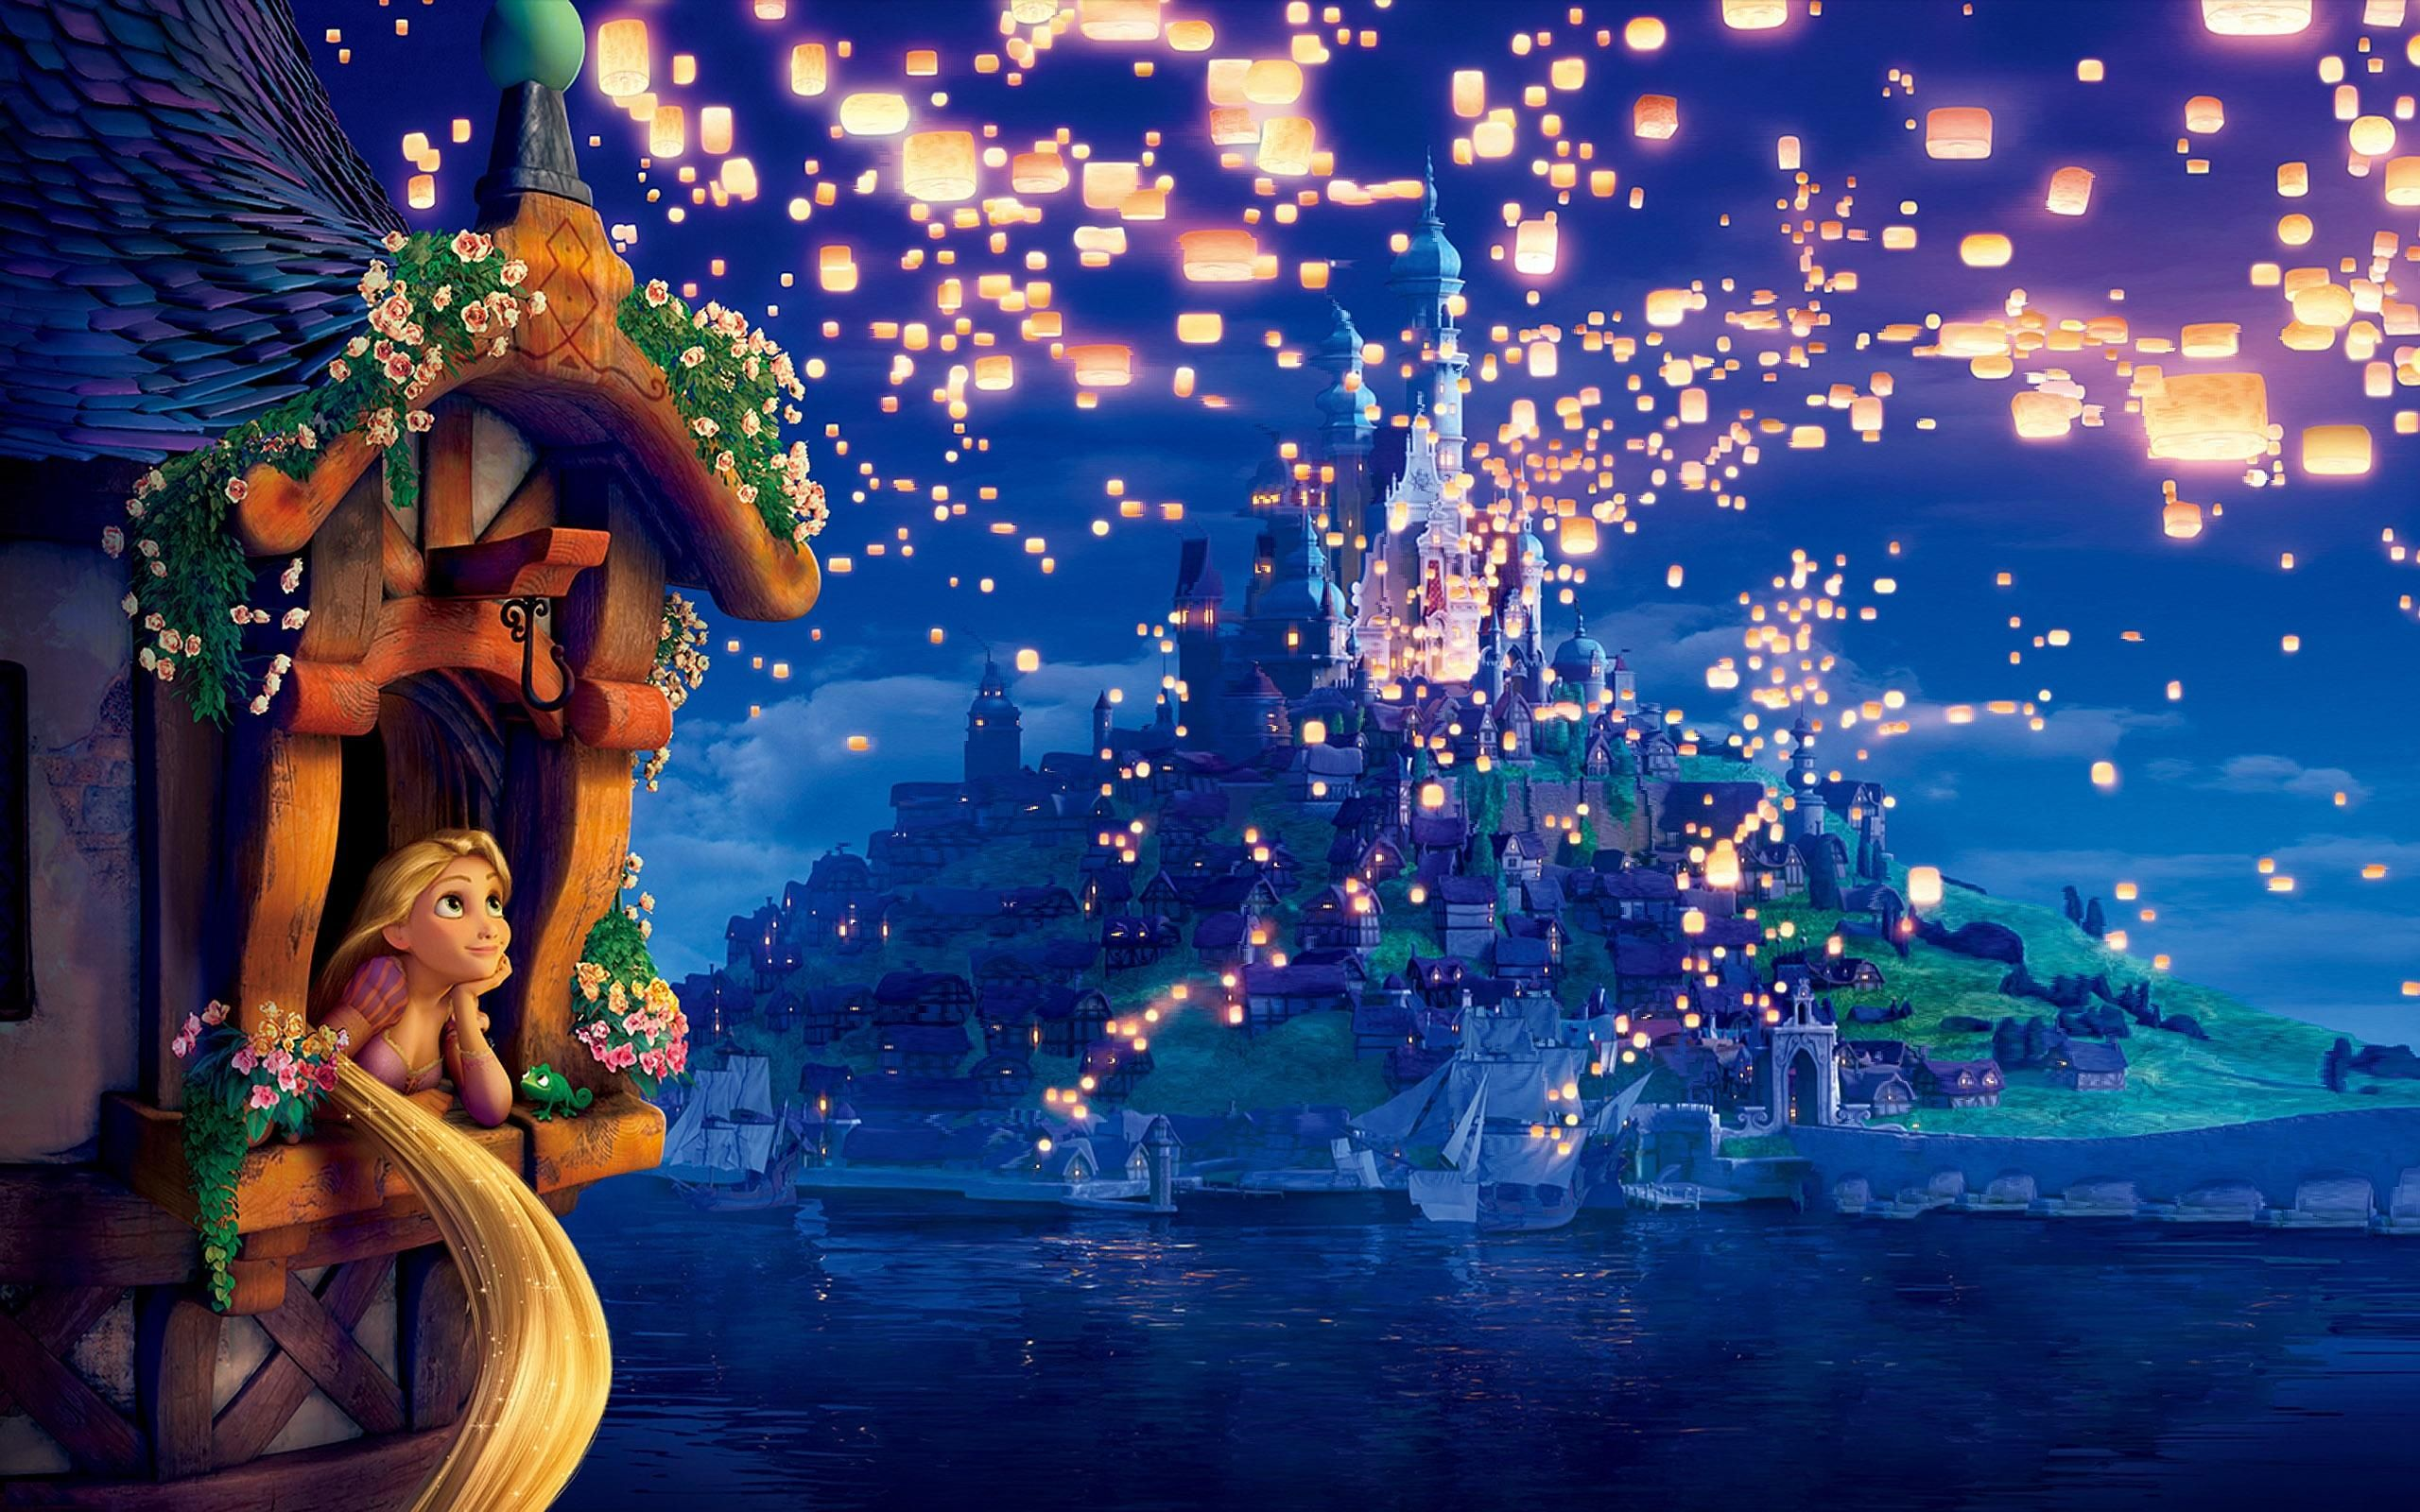 Tangled screen saver Disney background, Kinkade disney